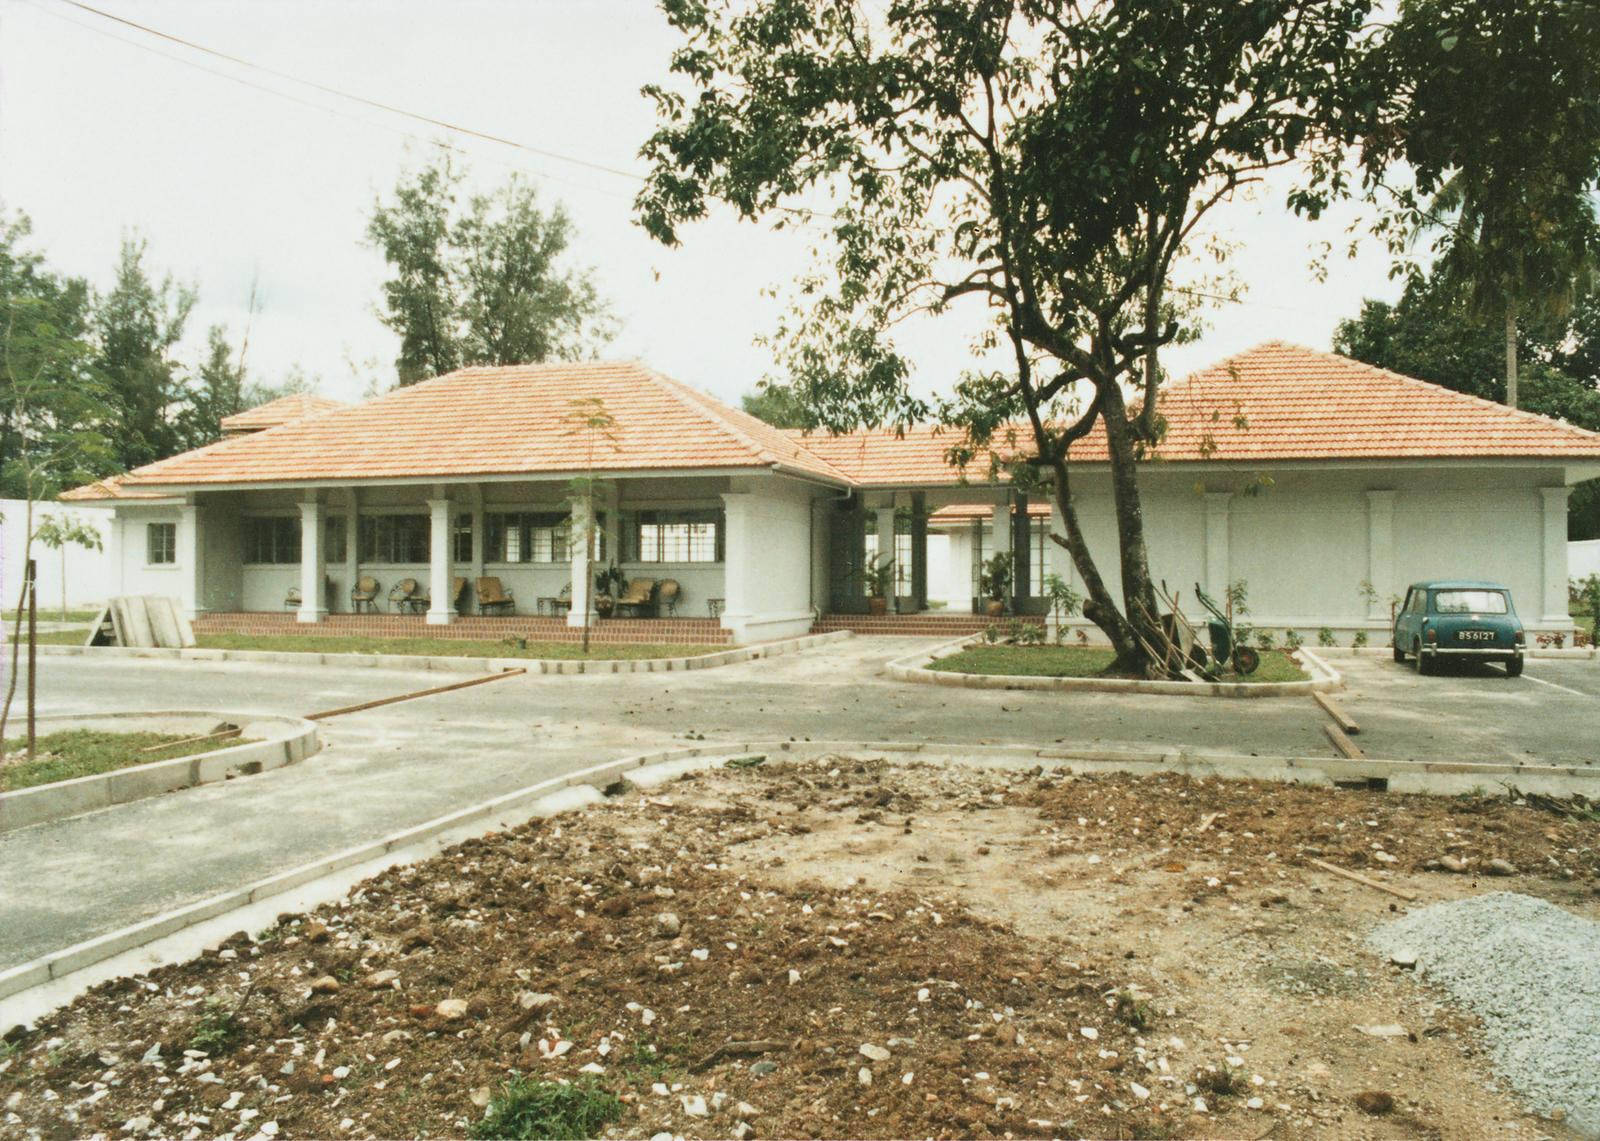 Kuala Lumpur - Recreation/Community Center/Gym/Theater - 1984